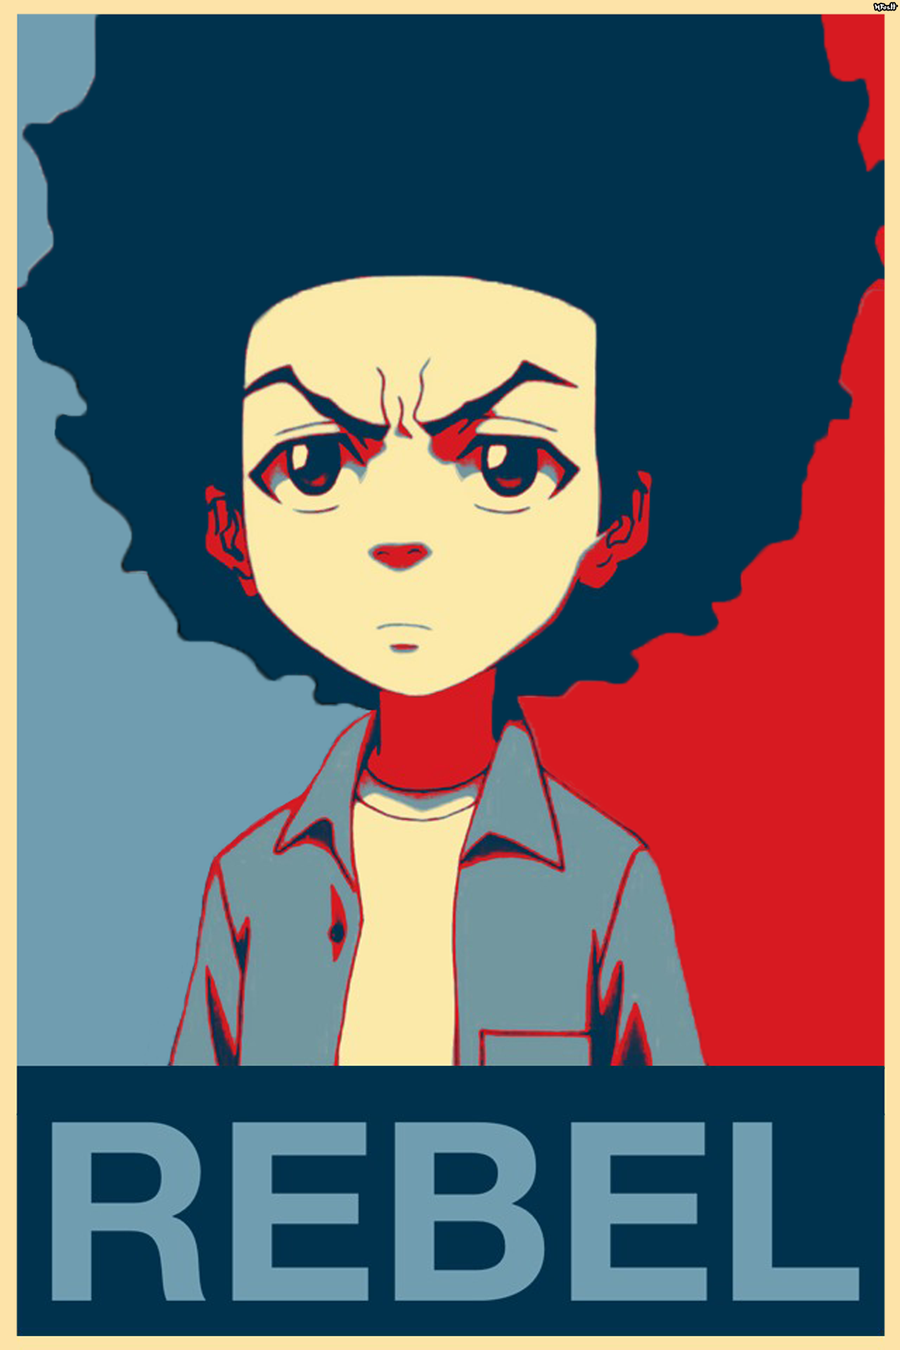 Huey Freeman Meme